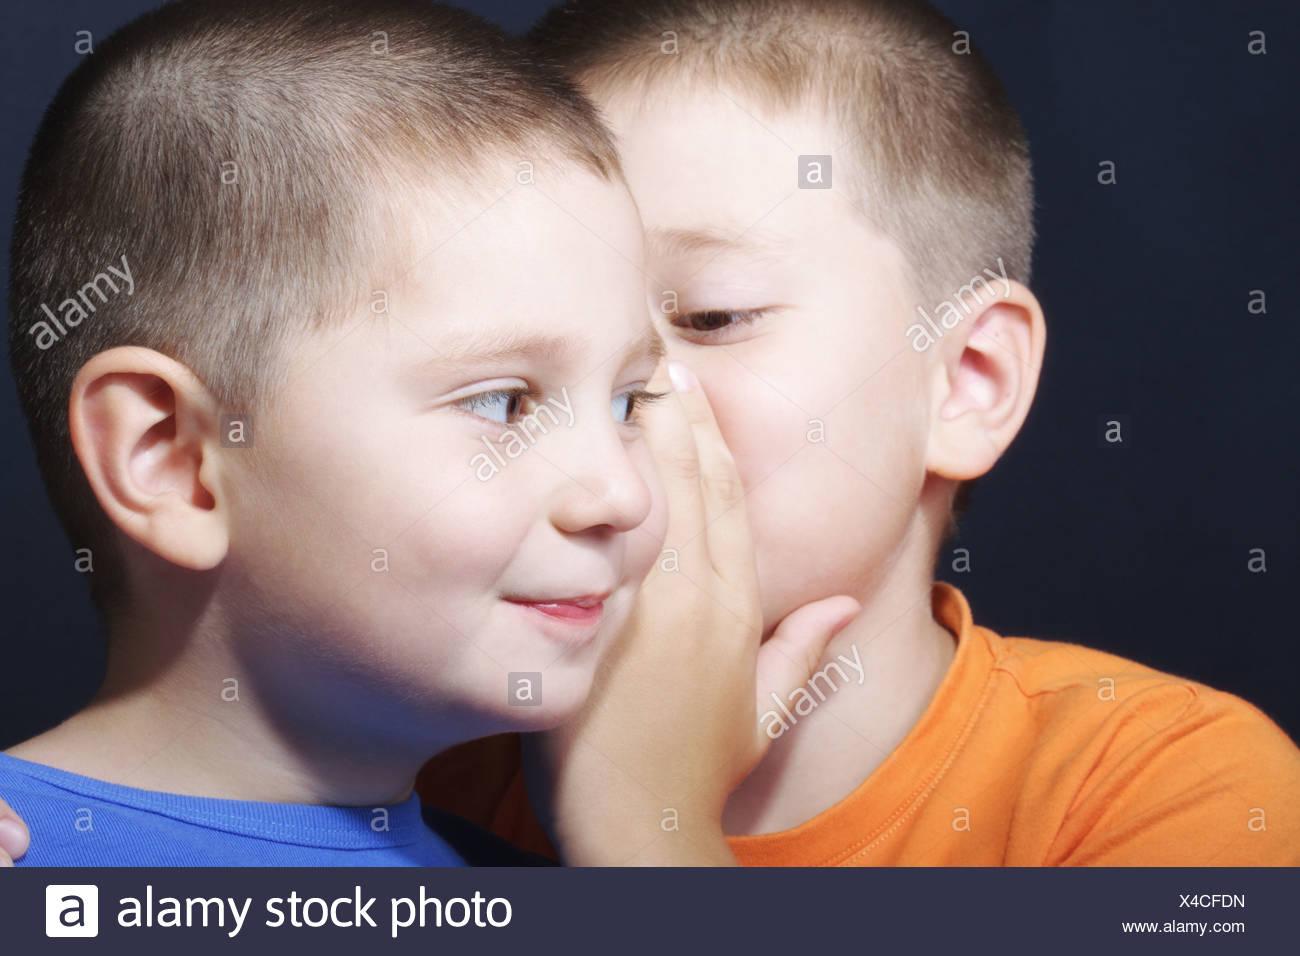 Brothers sharing secrets - Stock Image